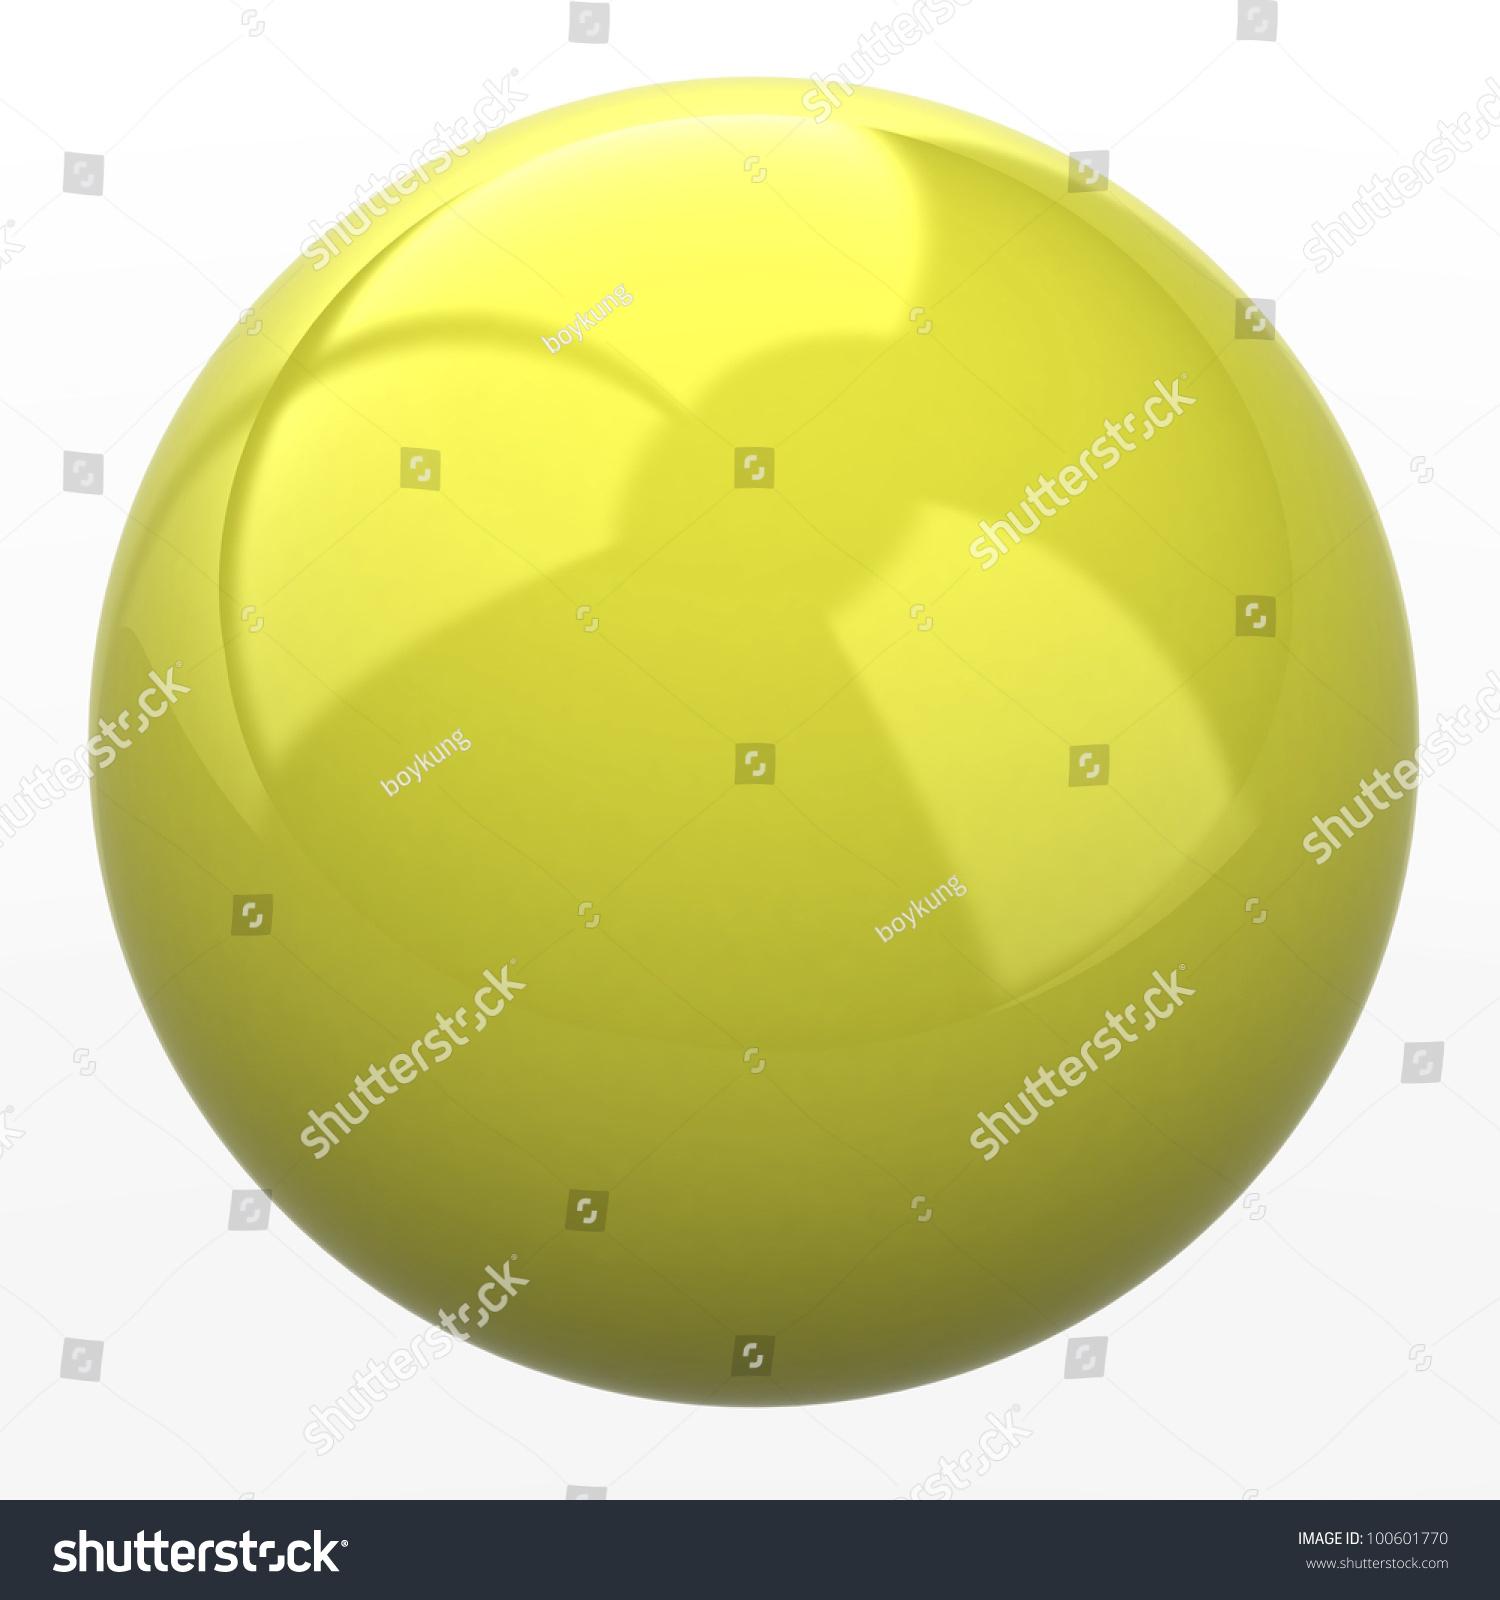 Yellow Sphere Stock Illustration 100601770 - Shutterstock